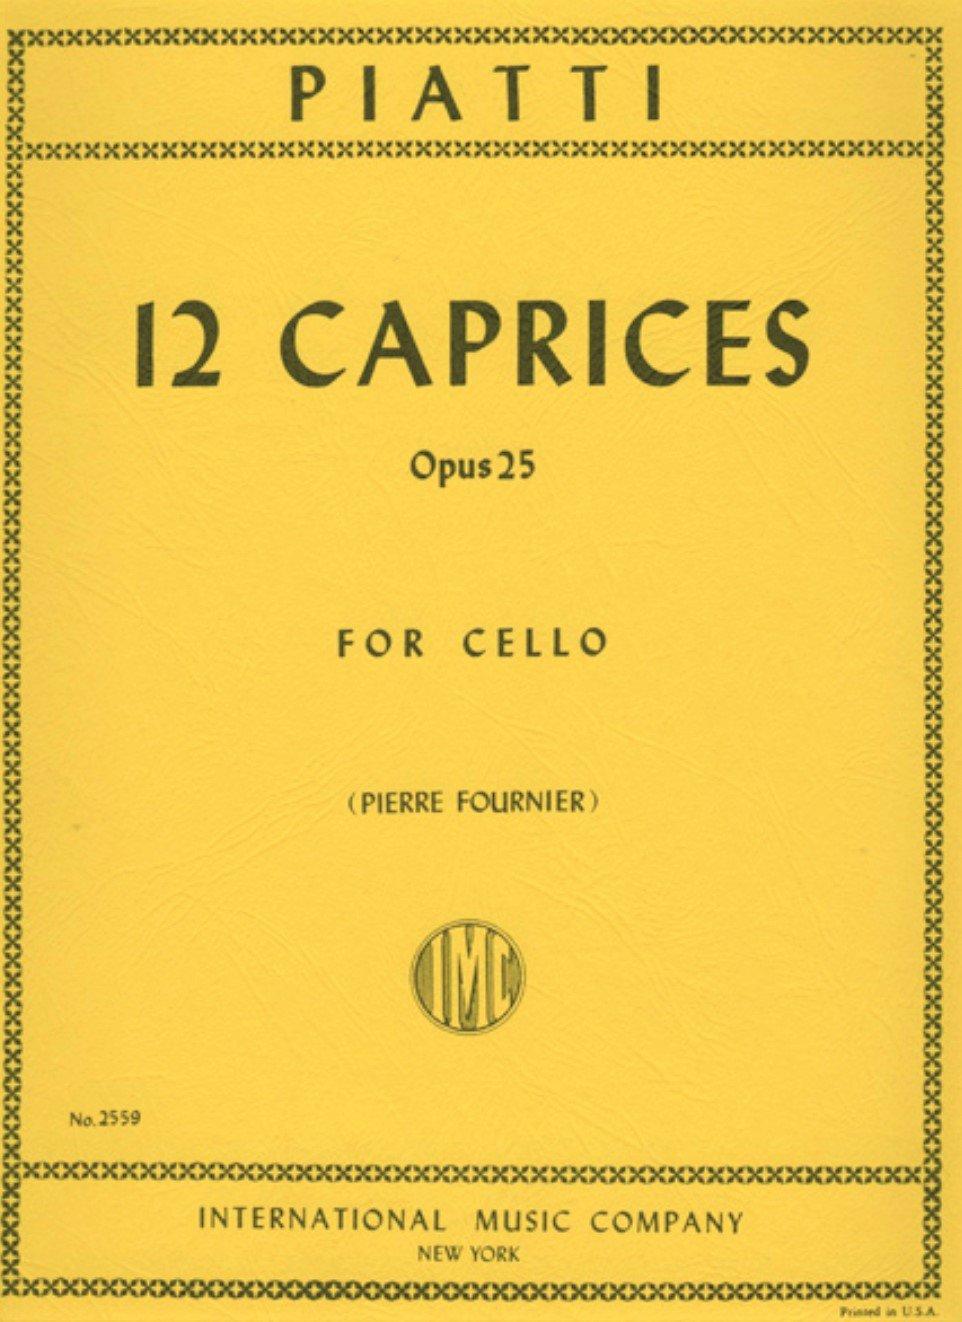 12 Caprices Op 25 - Piatti - Cello - Fournier - International